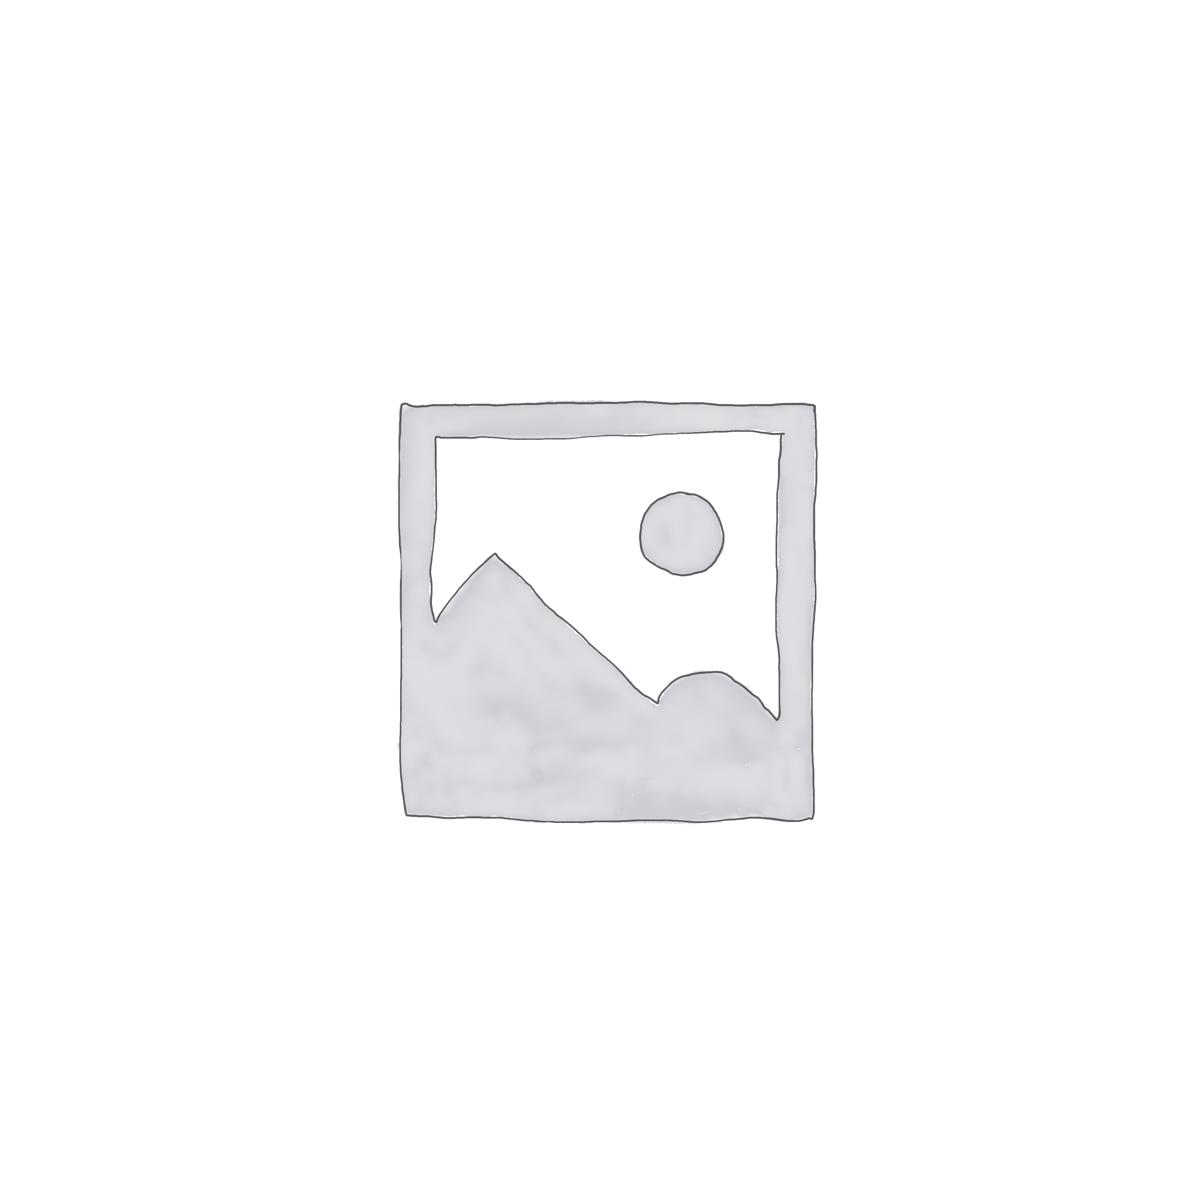 Kids Cartoon Sea Underwater with Fish Man Wall Decal Sticker